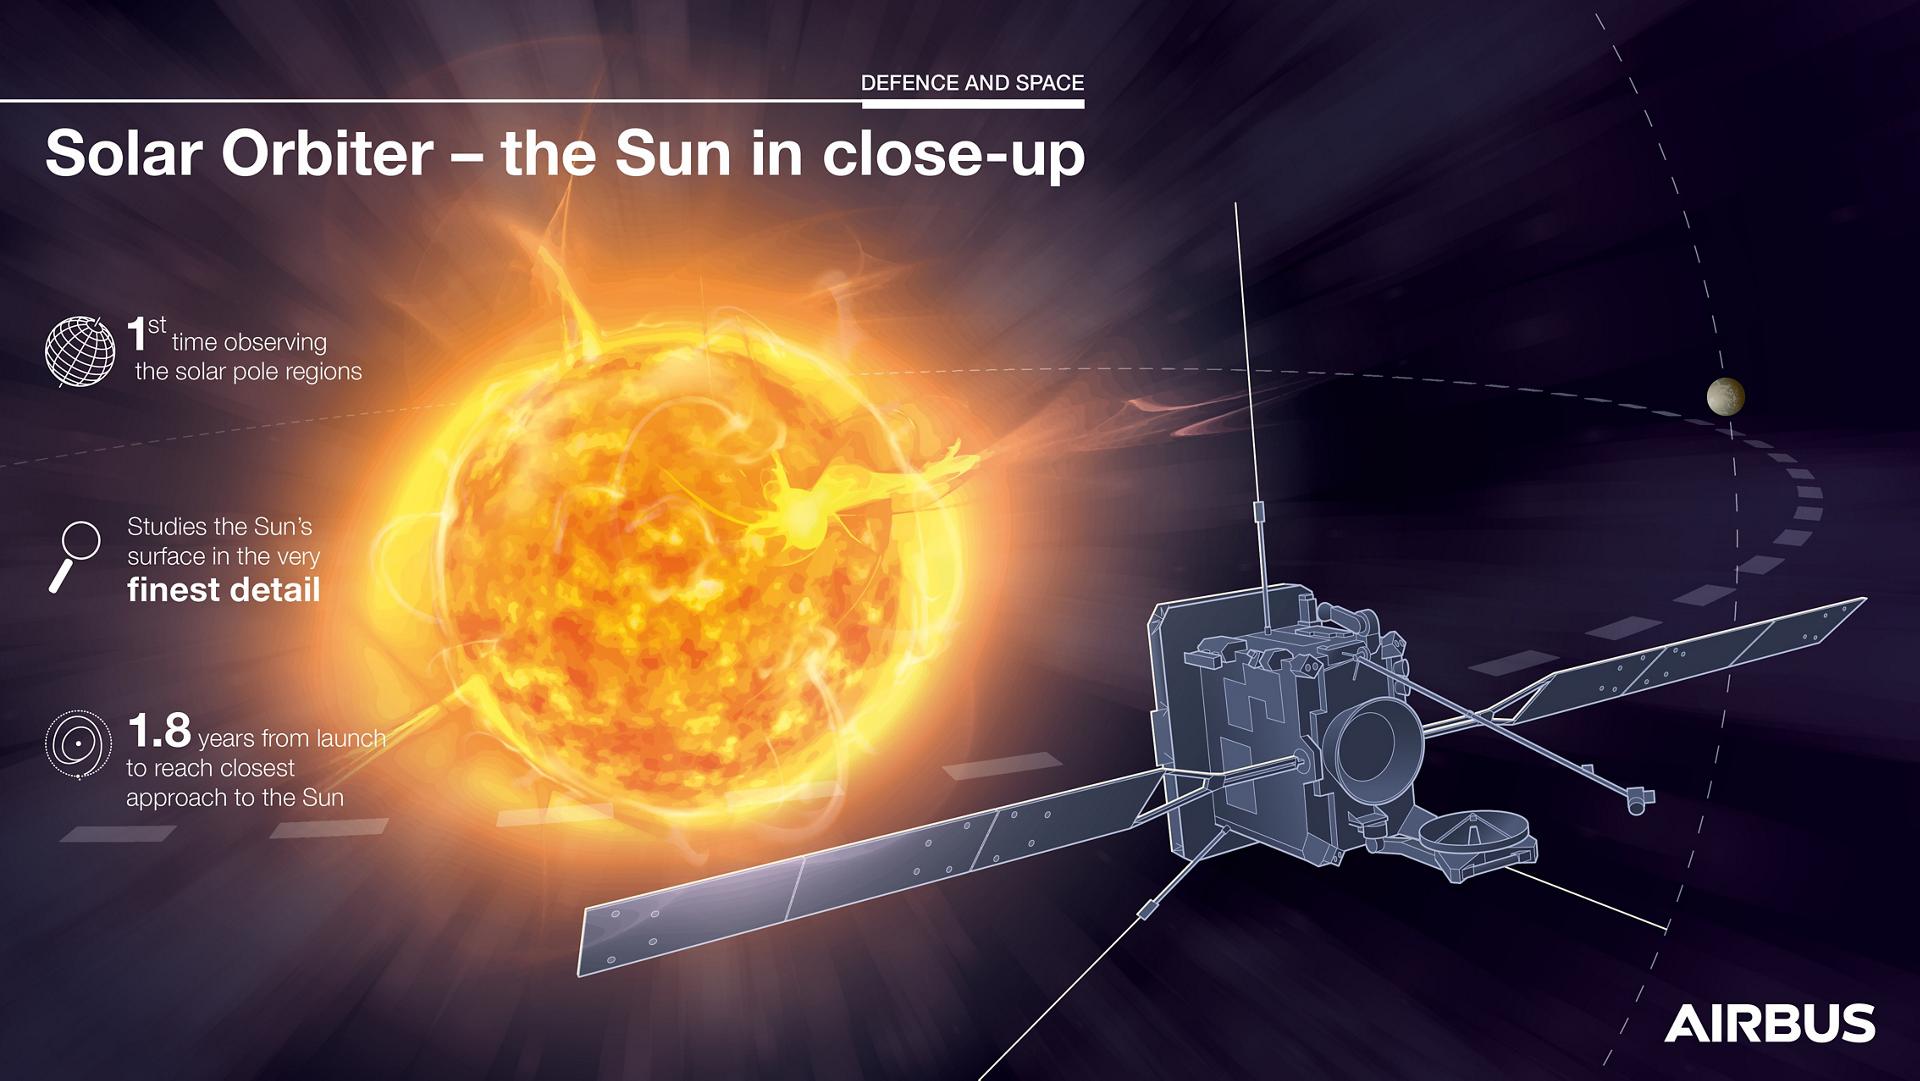 Solar Orbiter - The sun in close-up